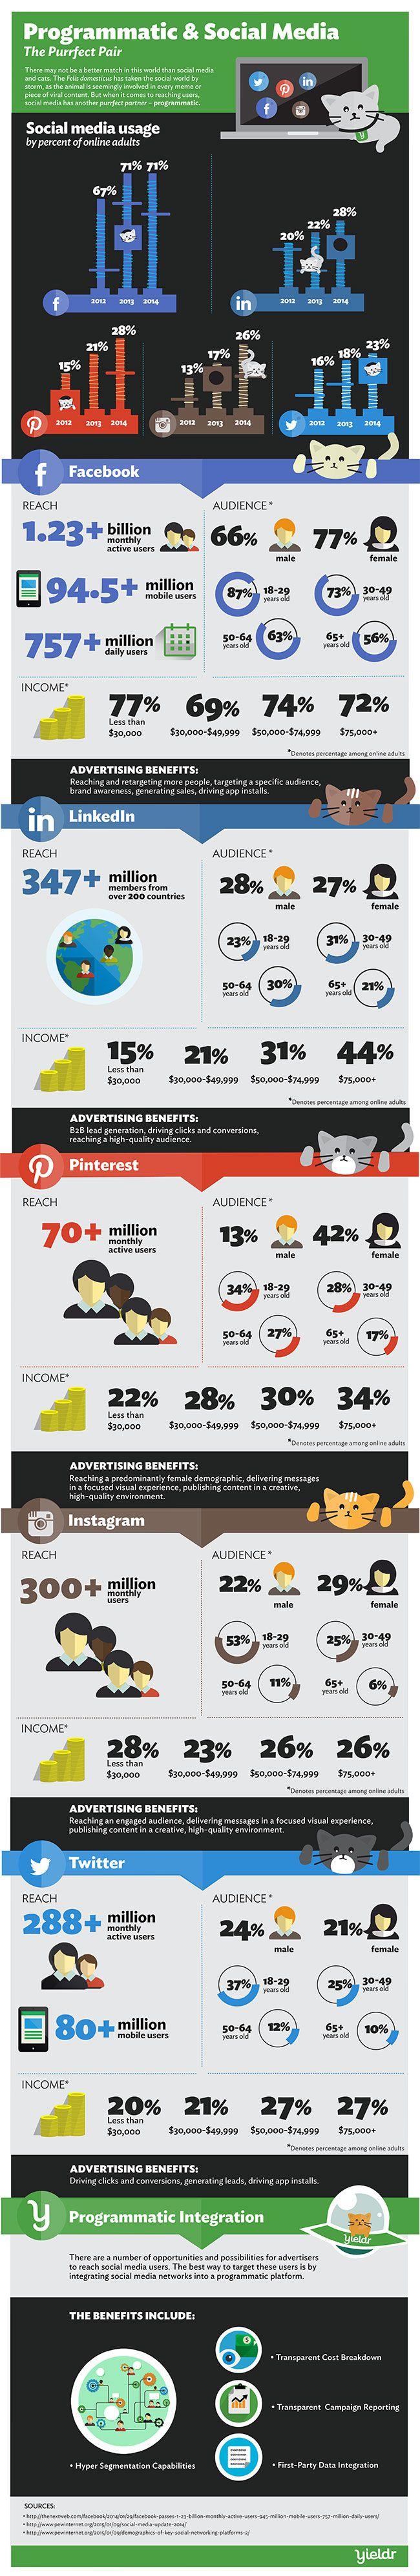 Programmatic-Social-Media-Infographic_650px